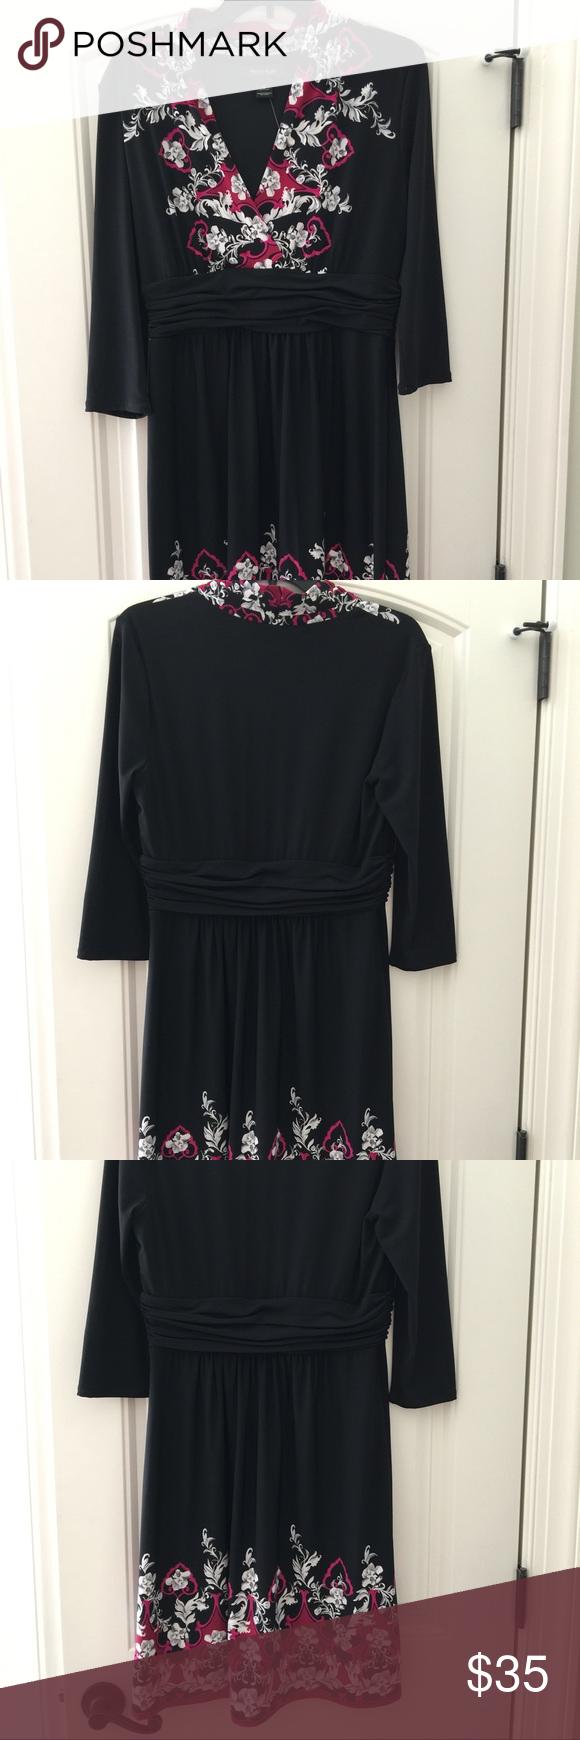 White house black market dress size